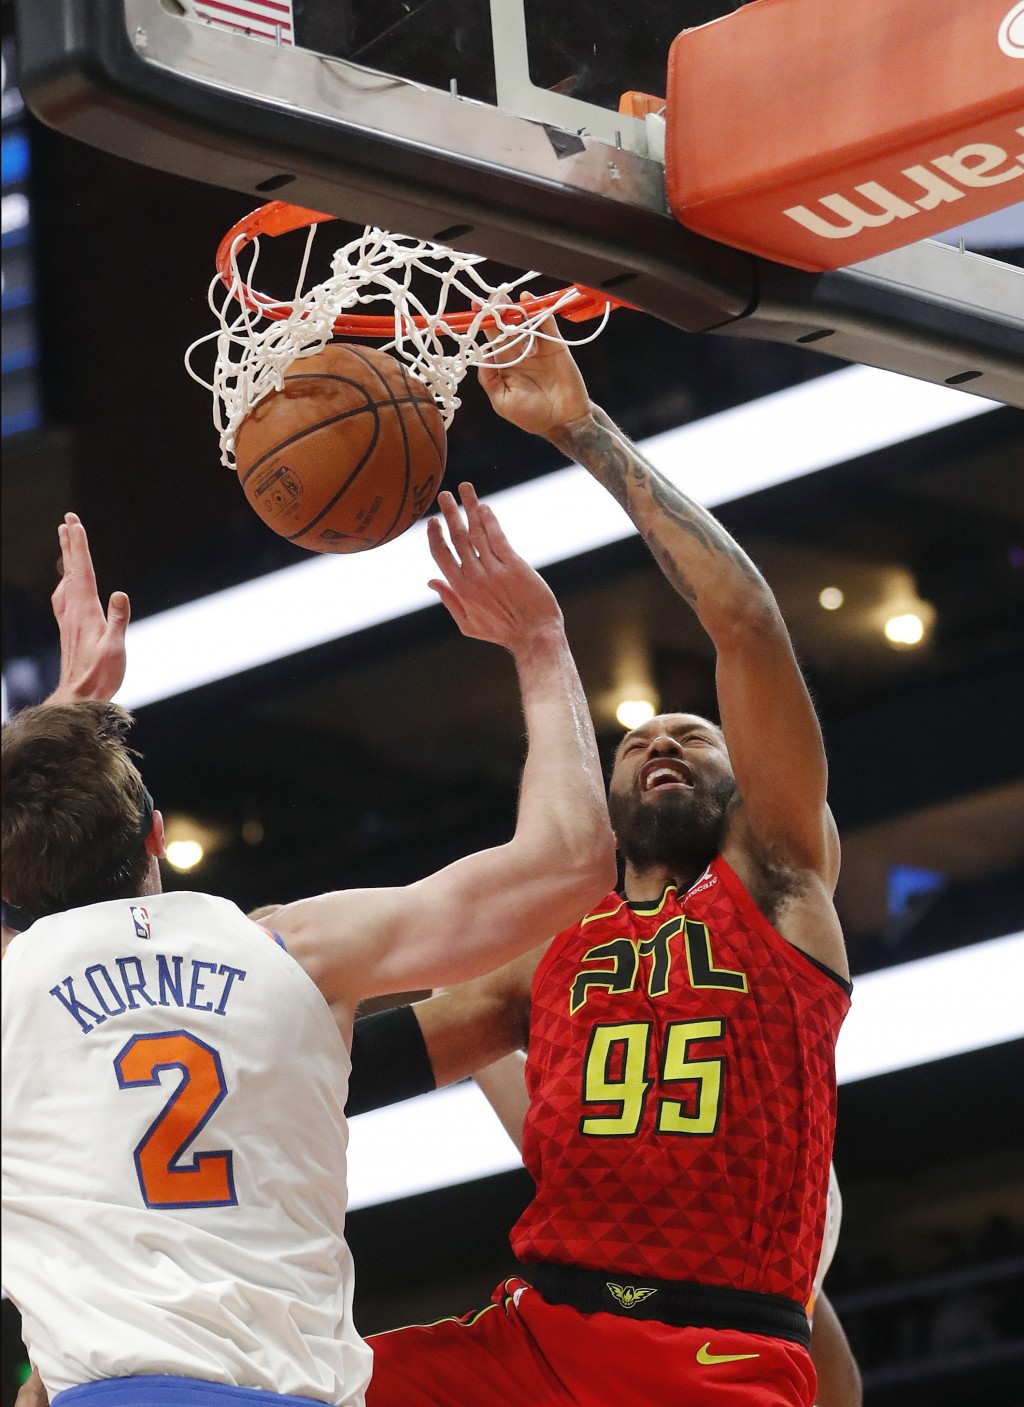 Atlanta Hawks forward DeAndre' Bembry (95) scores as New York Knicks forward Luke Kornet (2) defends during the first half of an NBA basketball game T...